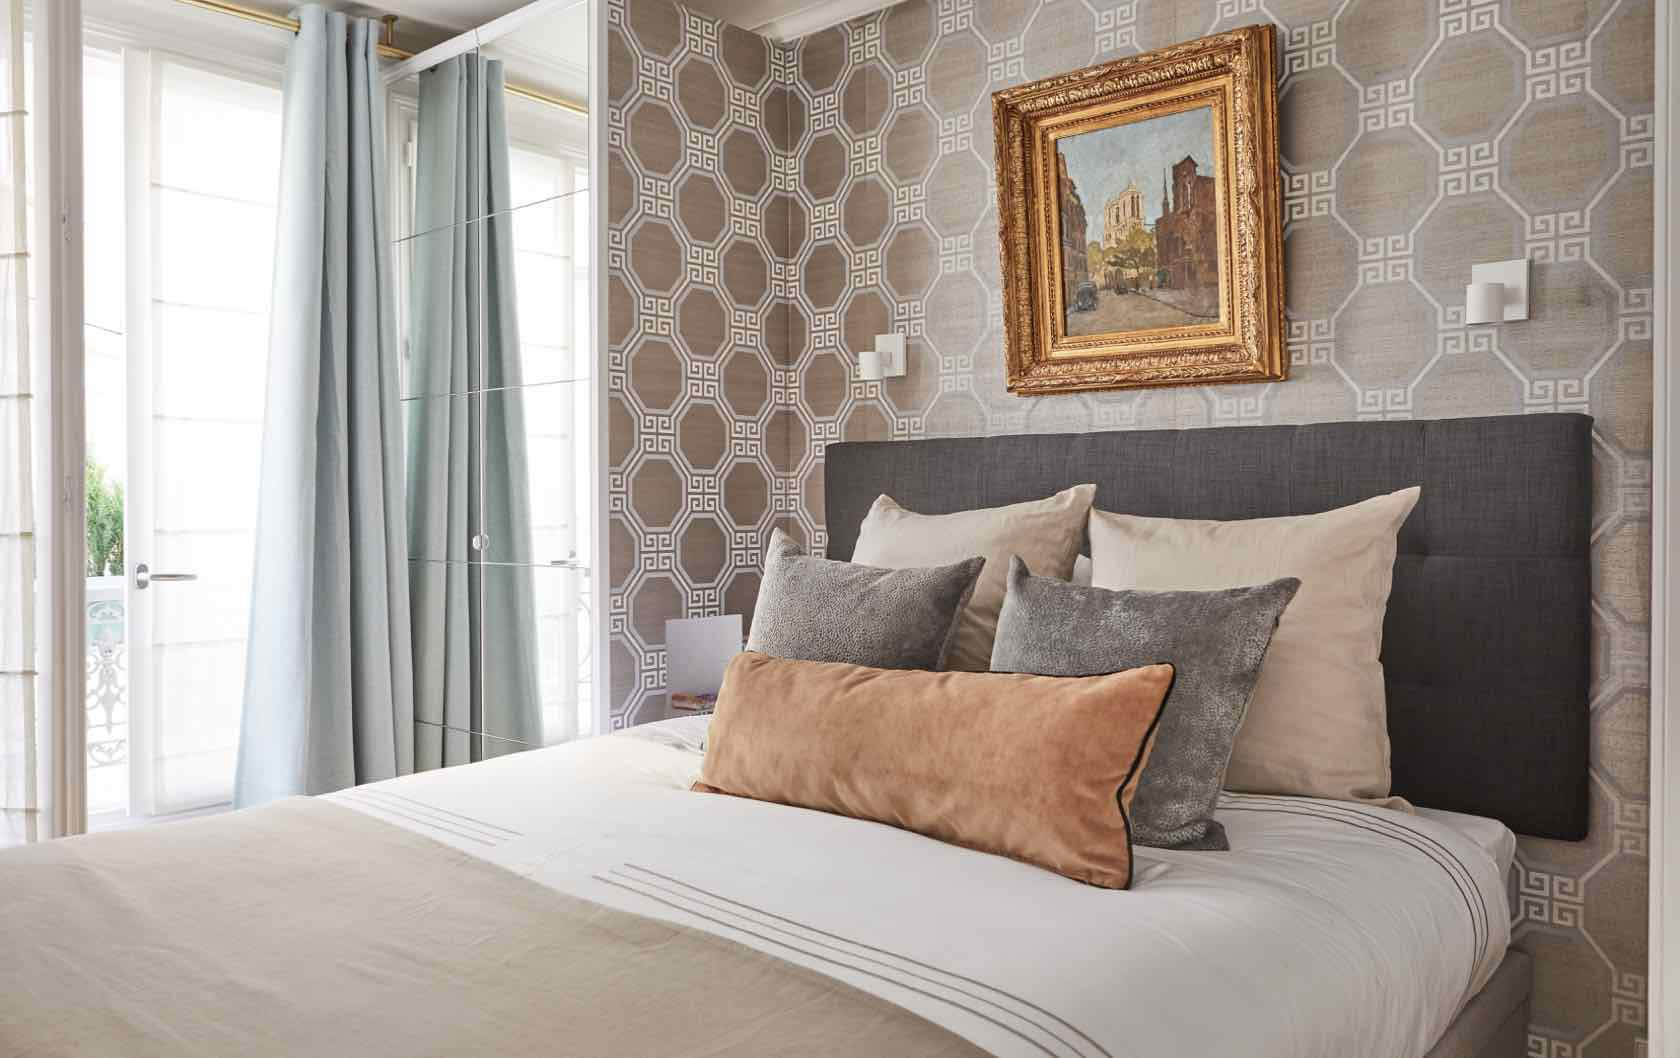 Conti fractional apartment bedroom Paris